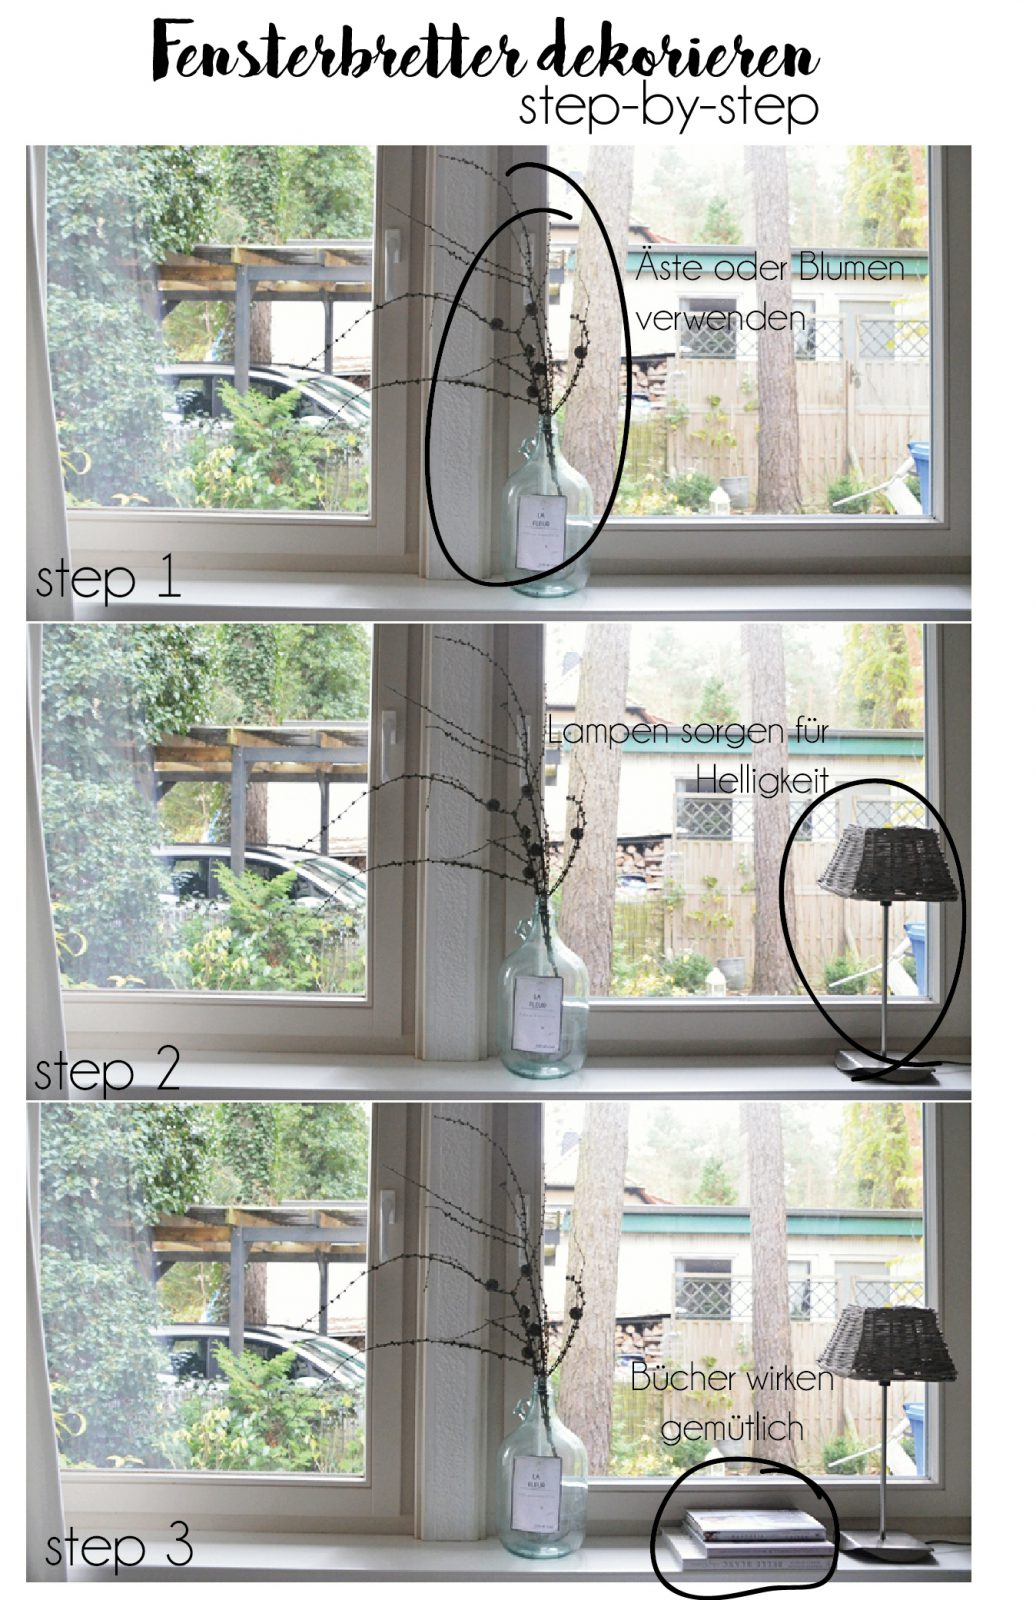 Fensterbrettdeko step-by-step Teil 1